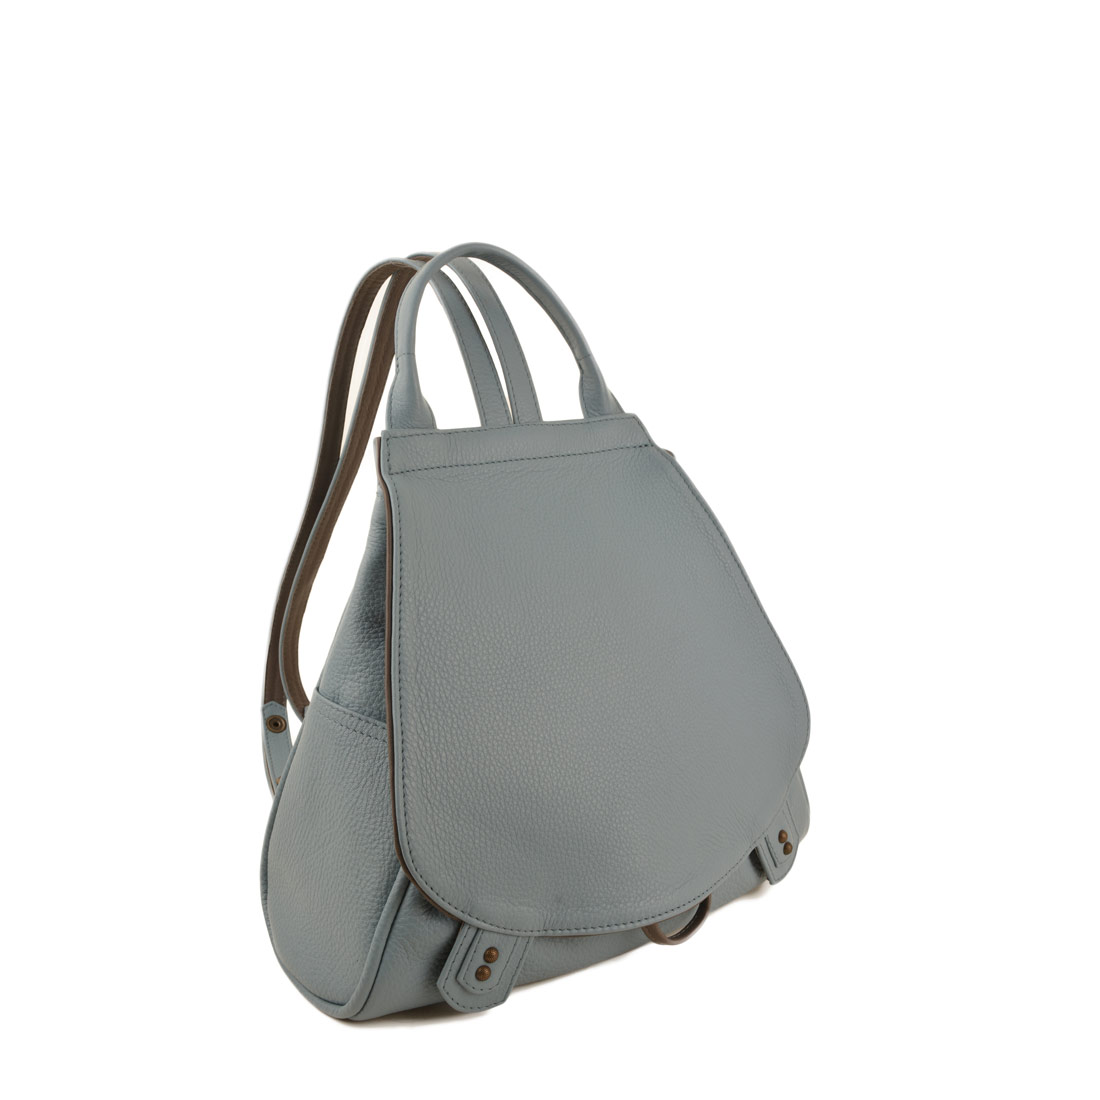 Daliya Niagra Leather Backpack